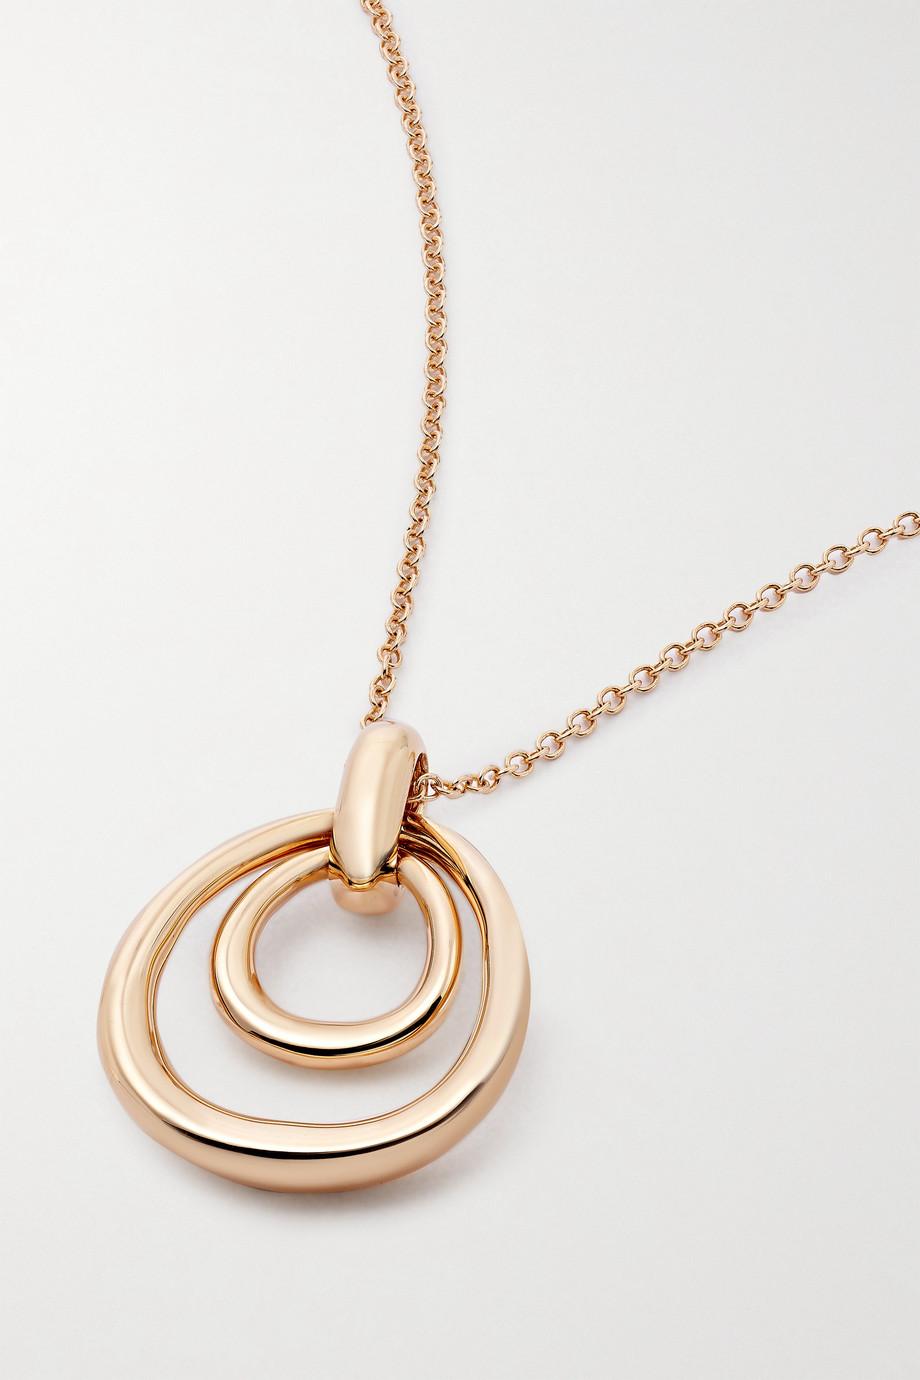 Pomellato Fantina 18-karat rose gold pendant